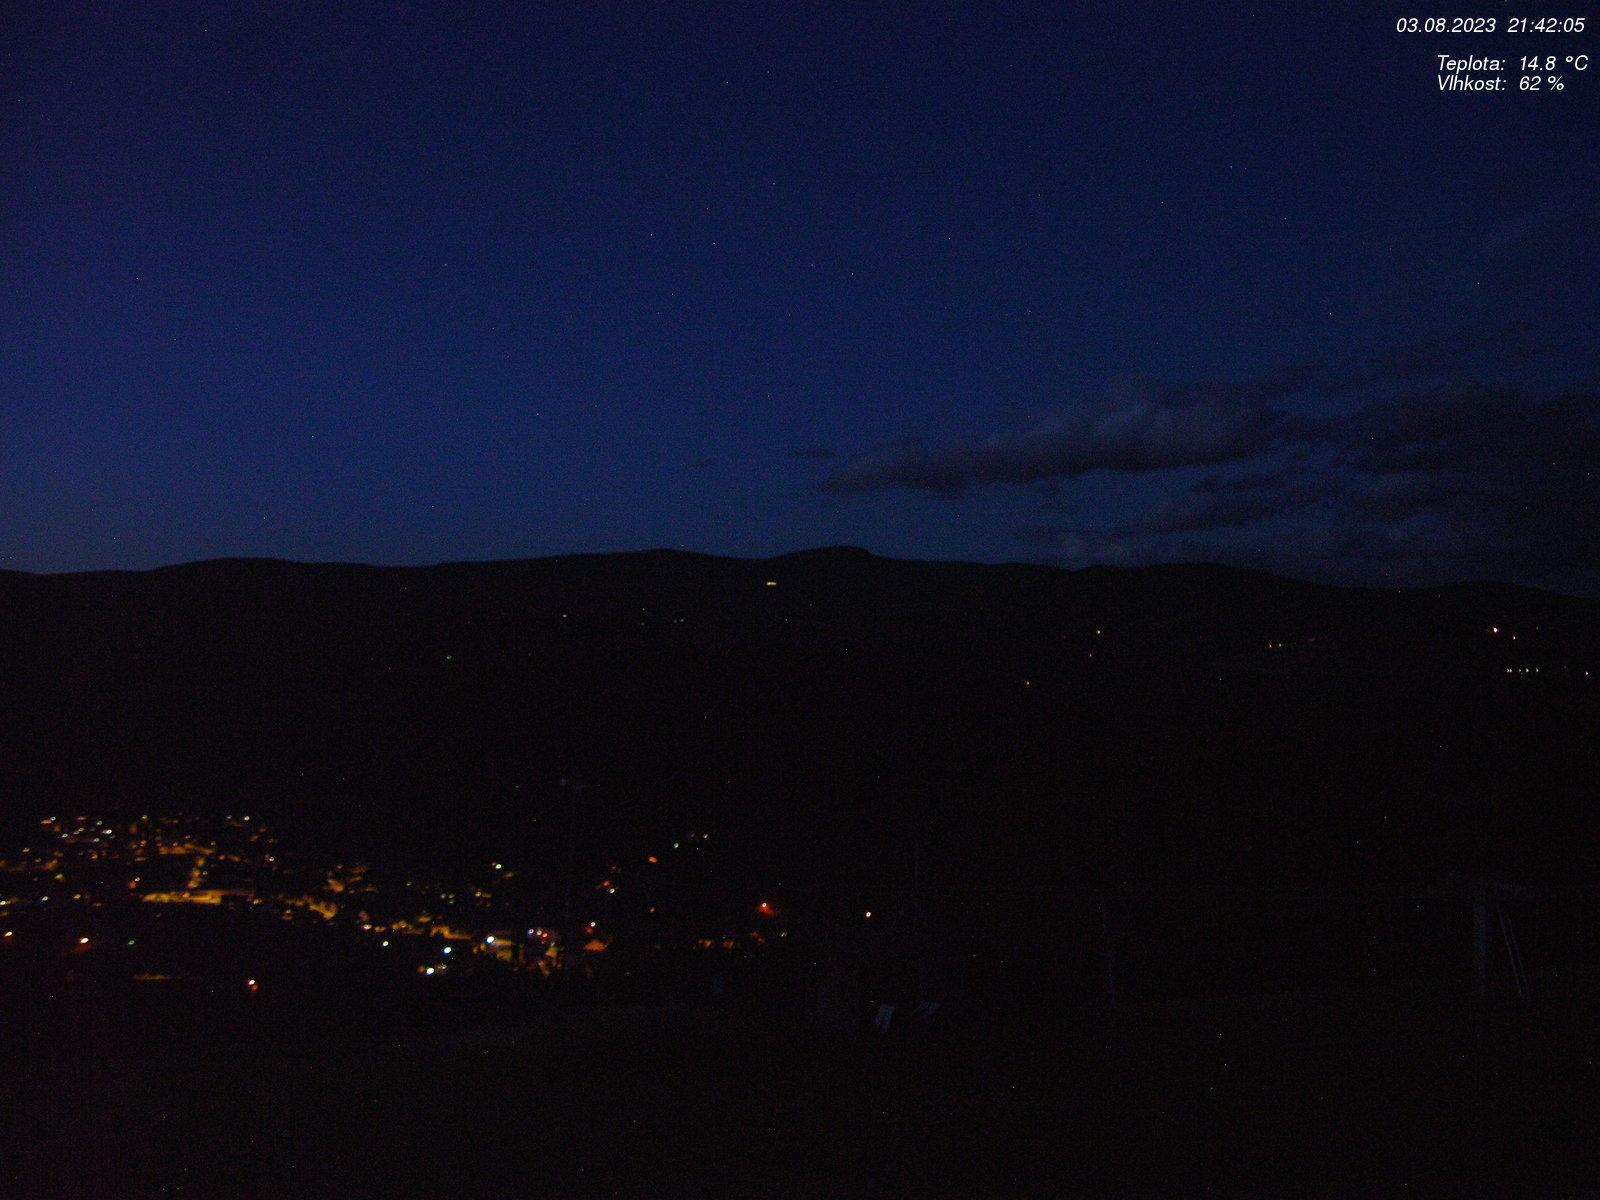 Webcam - Jablonec nad Jizerou